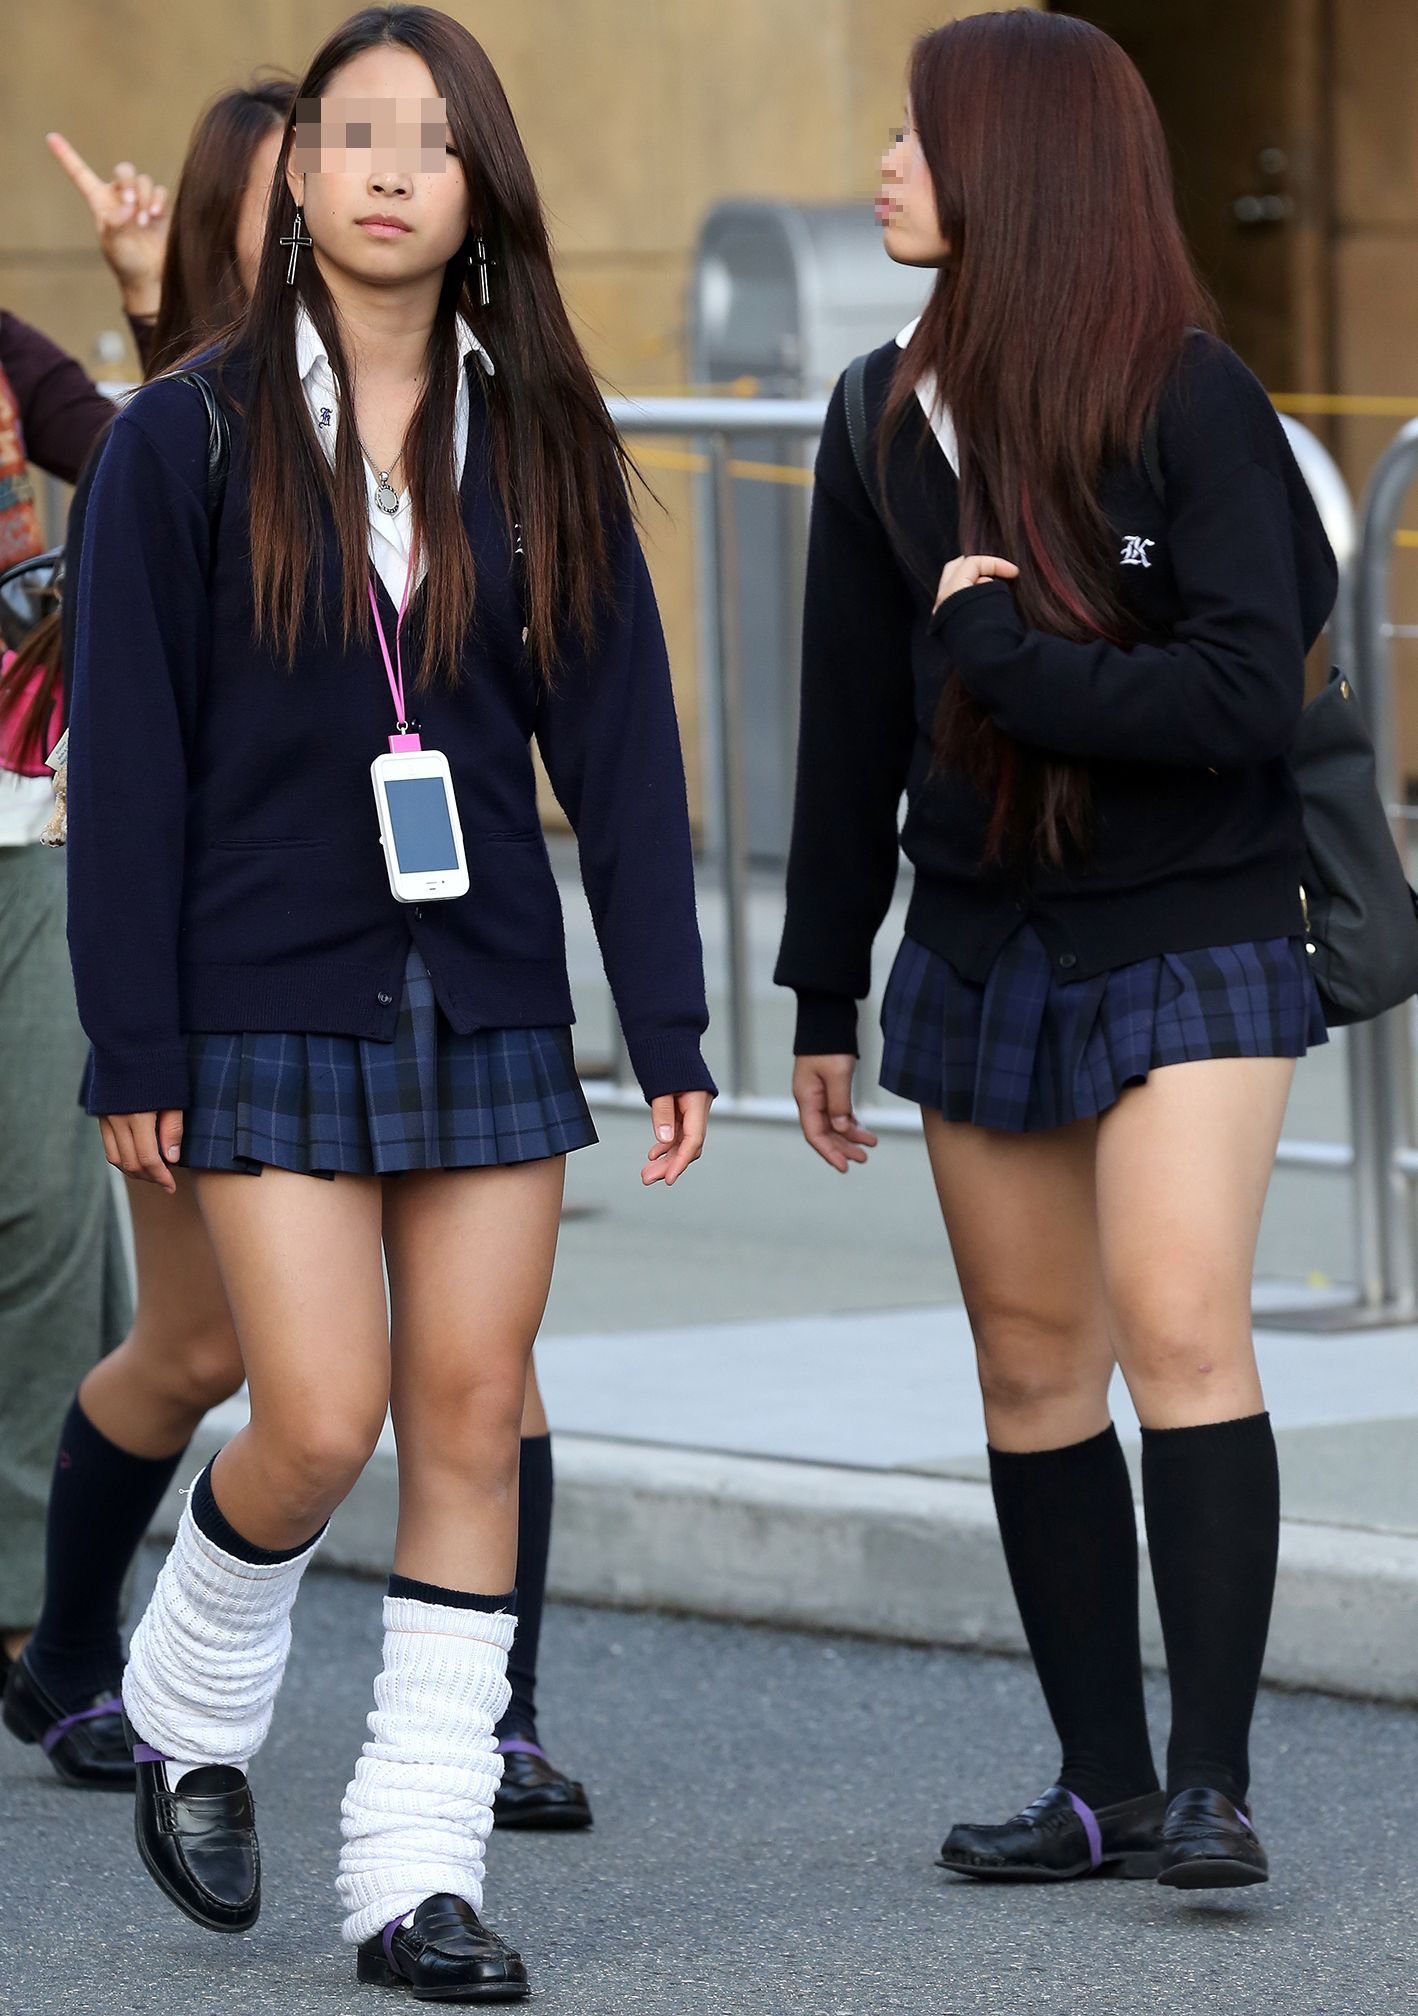 Candid Schoolgirl Upskirt